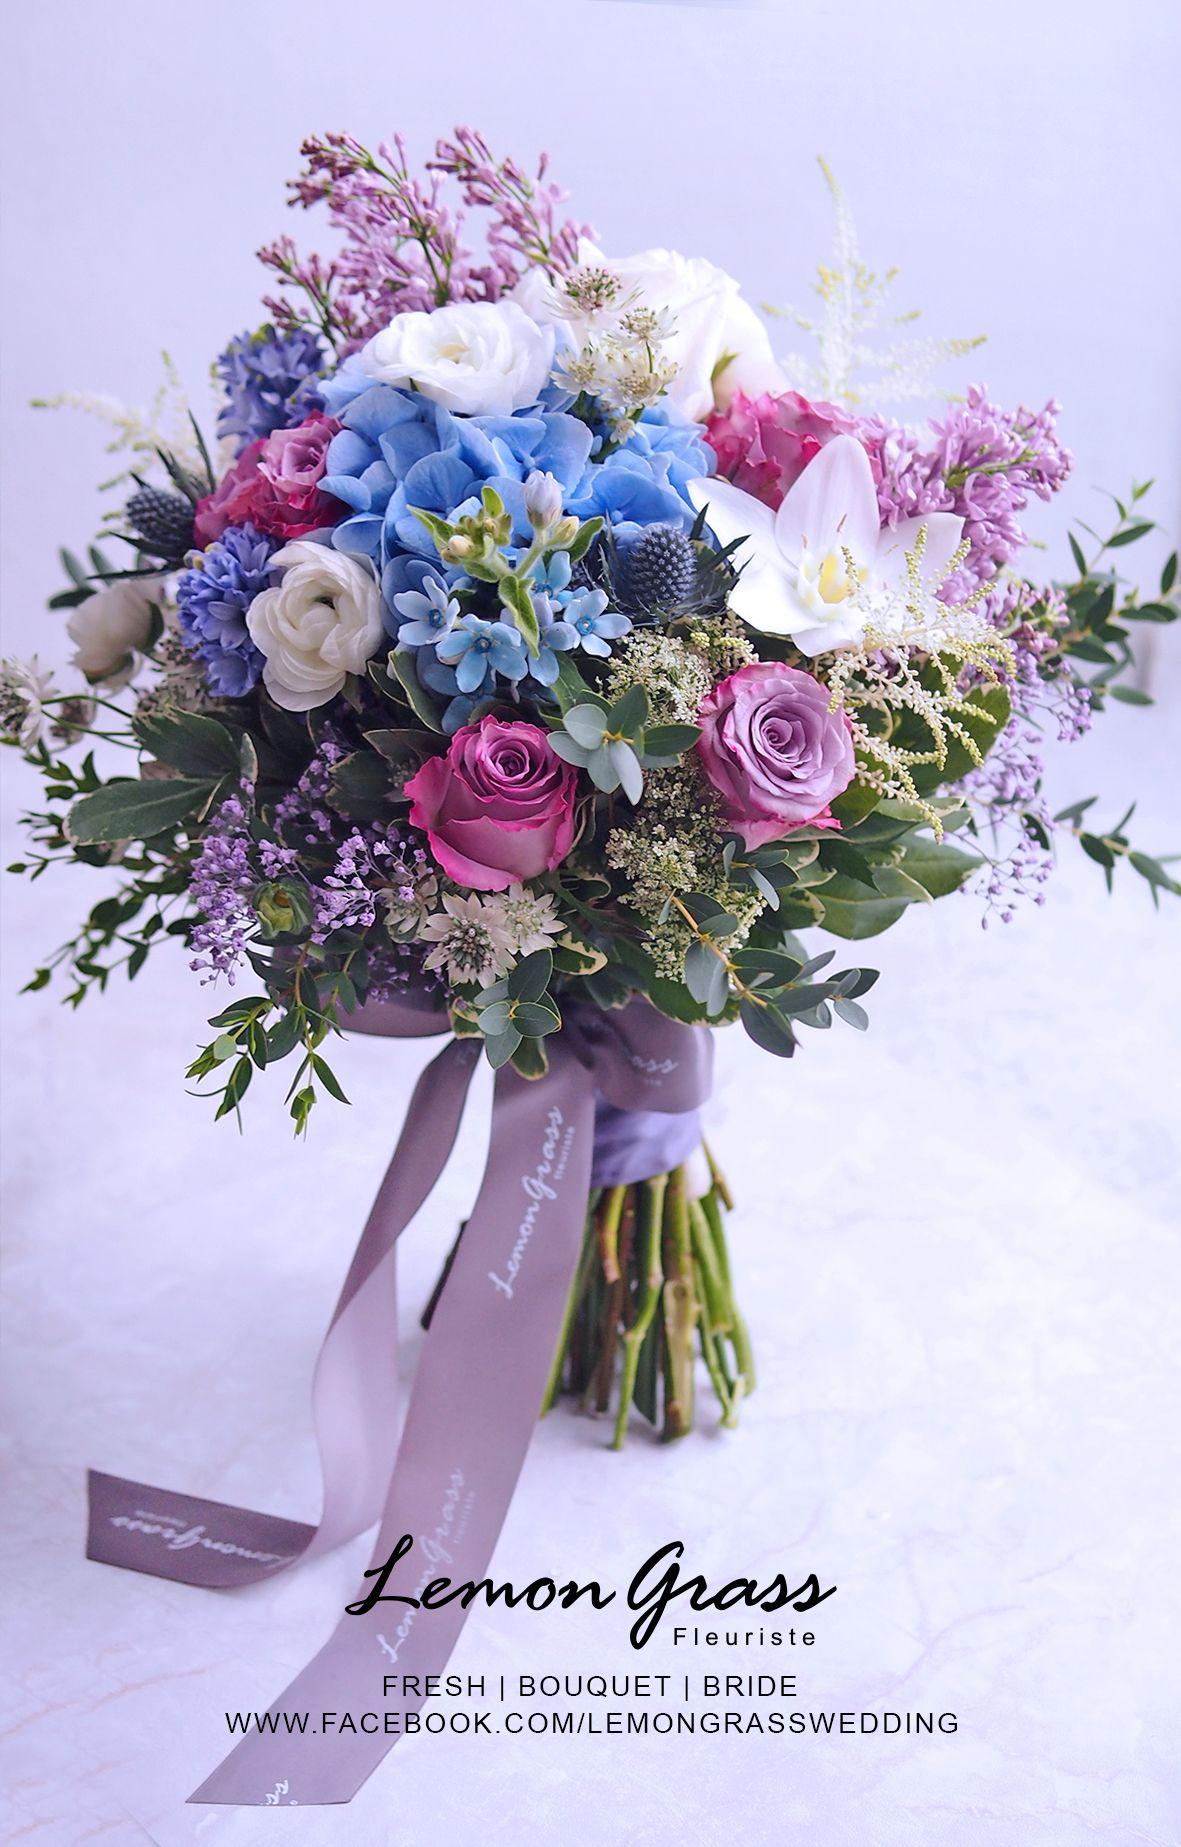 Fresh flowers facebooklemongrasswedding flower bride fresh flowers facebooklemongrasswedding flower bride bouquet izmirmasajfo